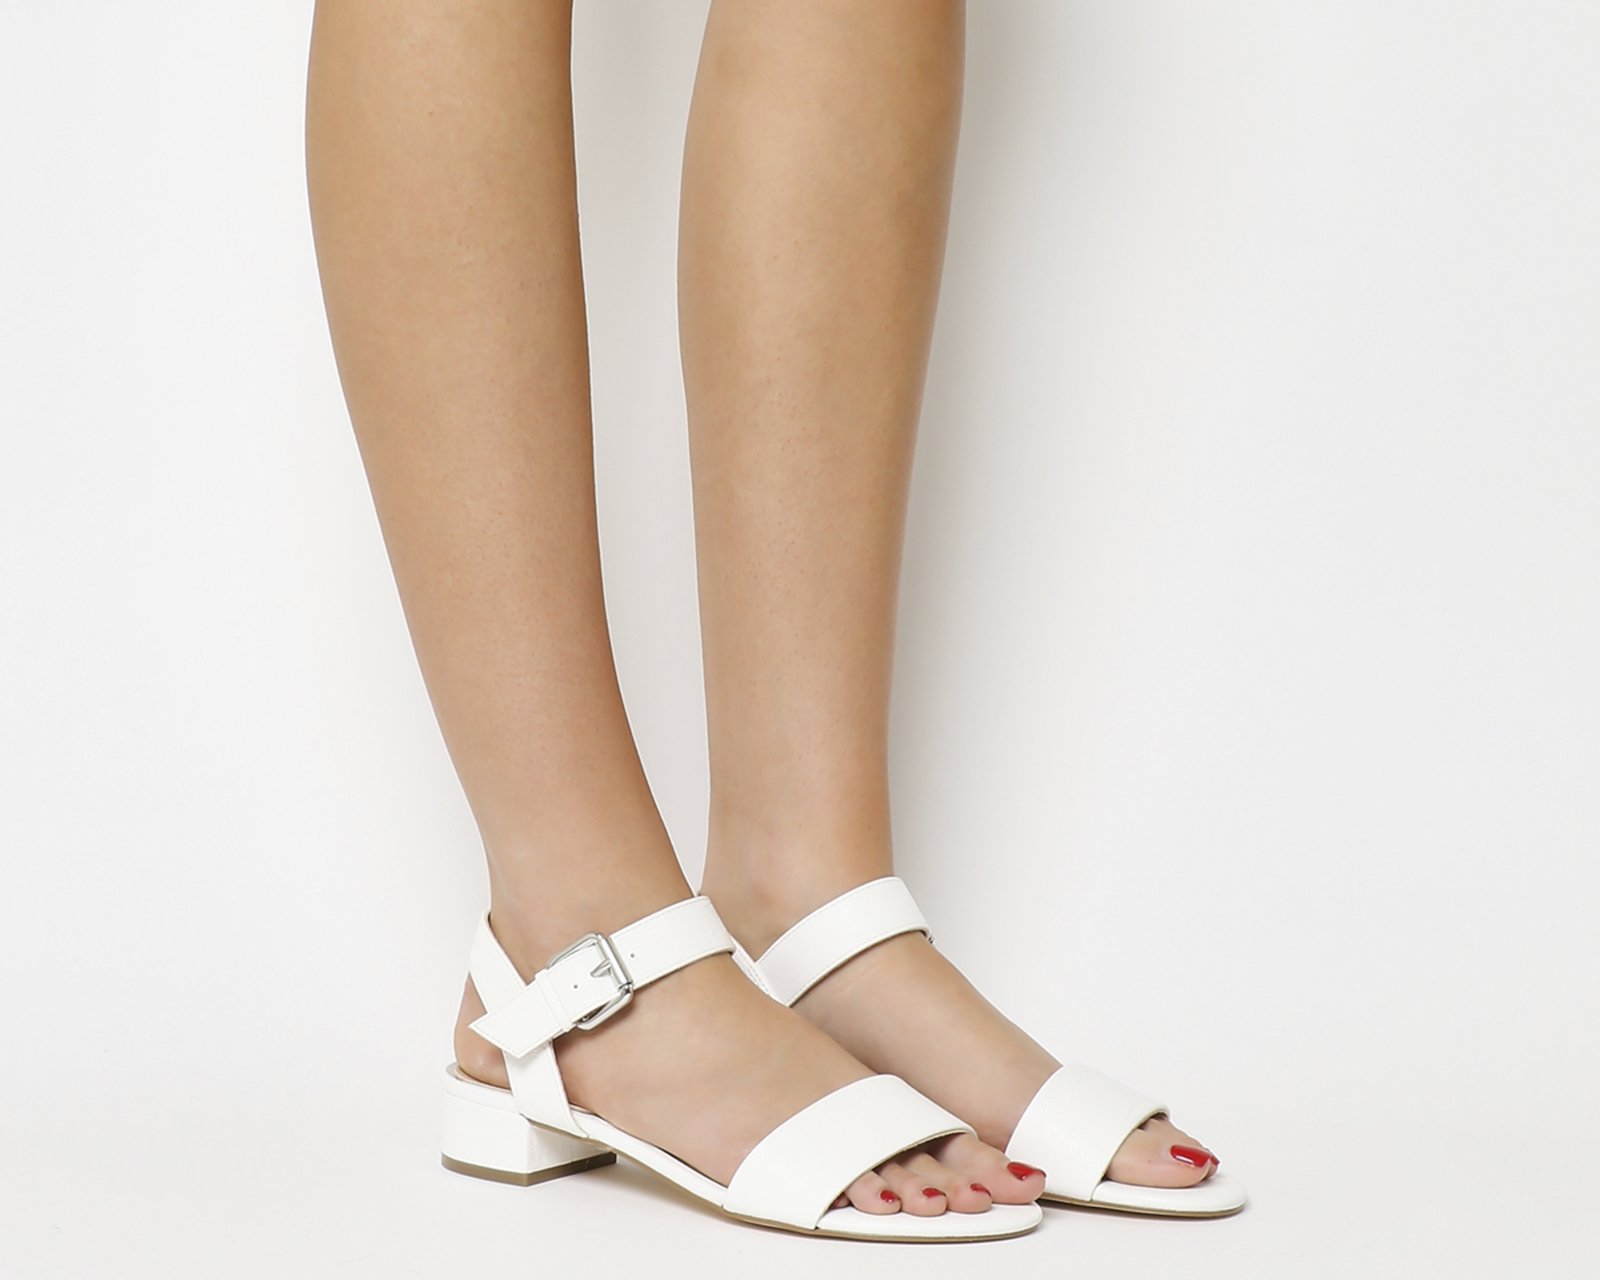 7586c5cdfbd Sentinel Womens Office Morgan Block Heel Sandals White Heels